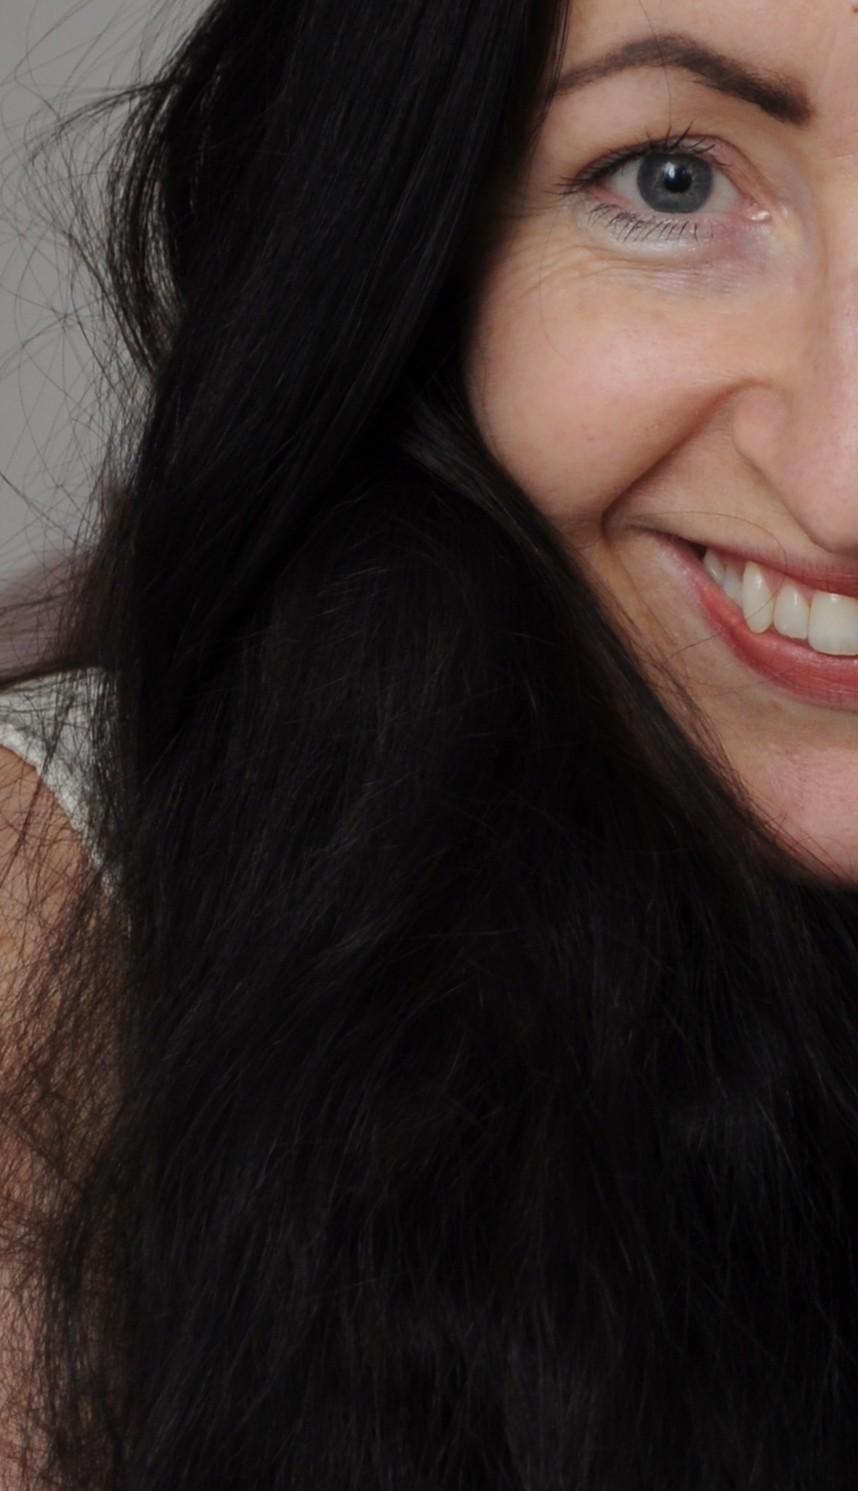 Forestina-Fotos's Profile Picture